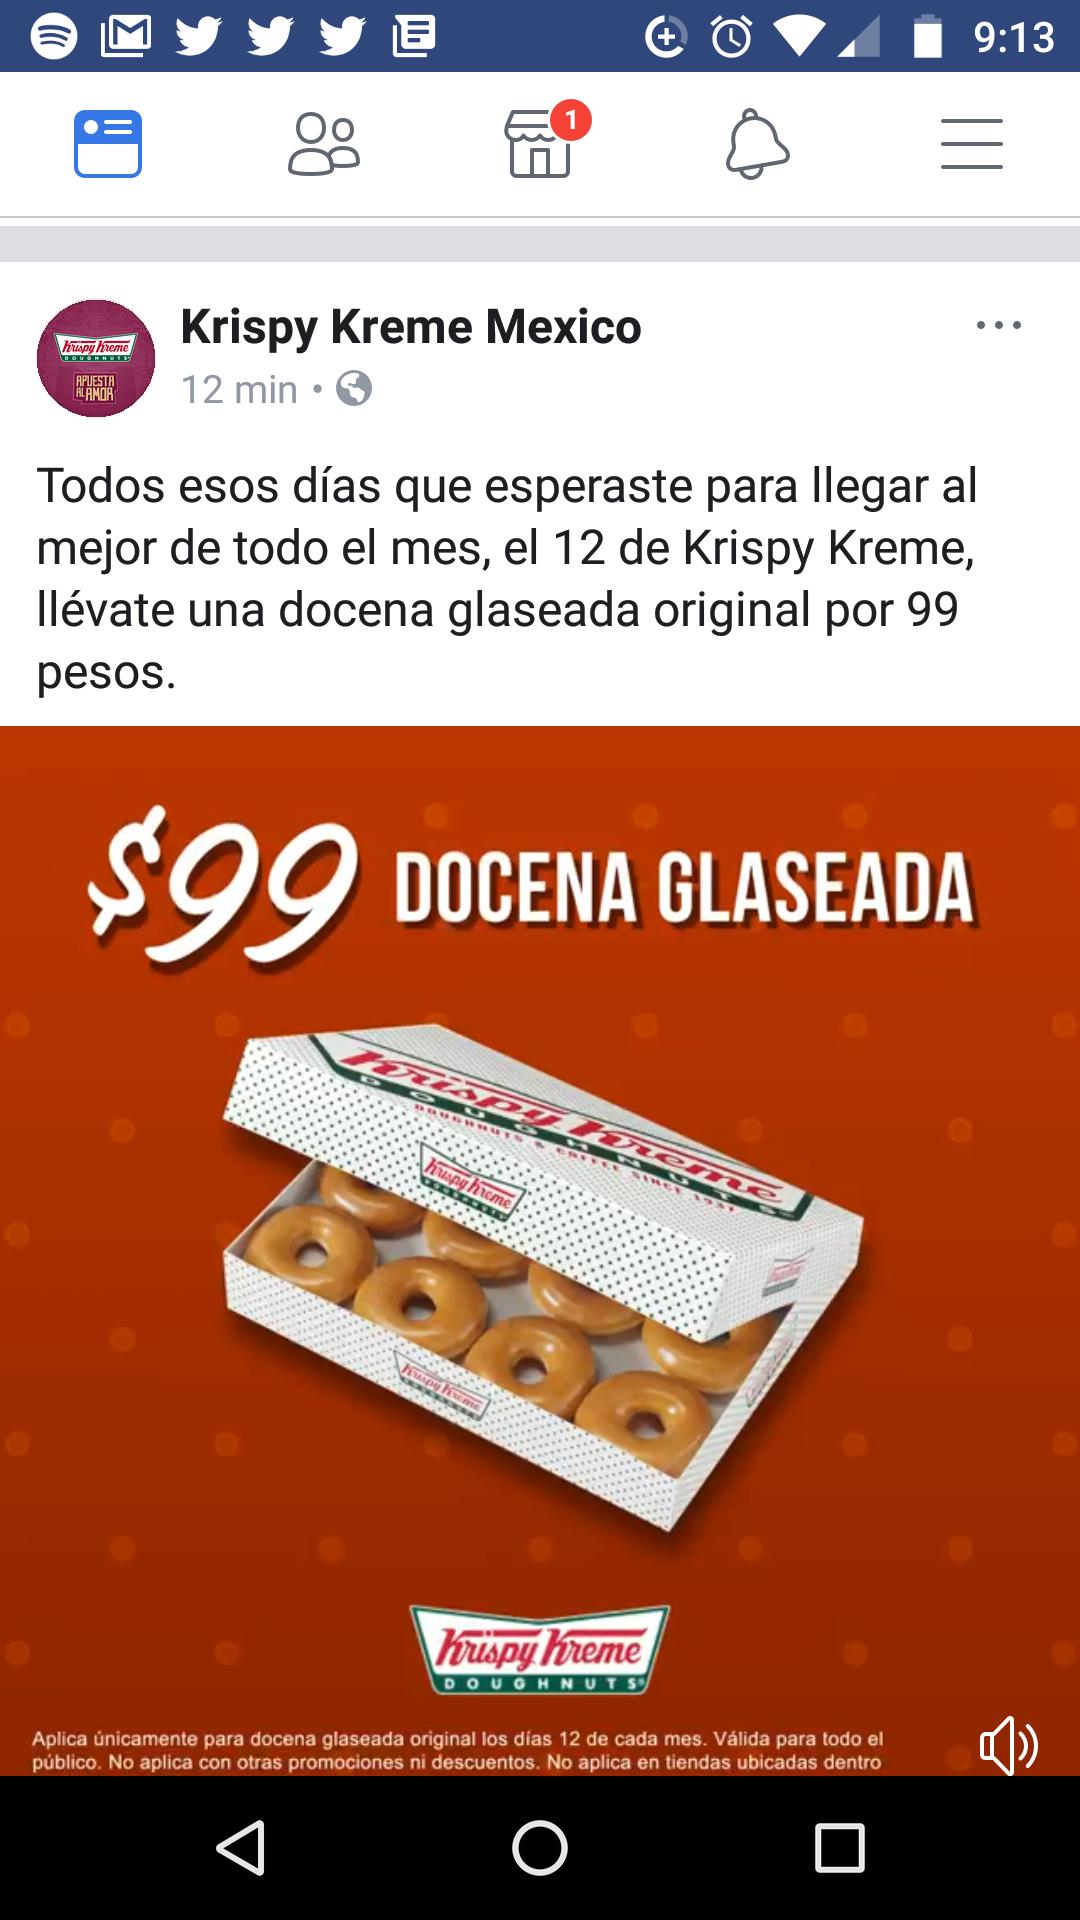 Krispy Kreme: Docena de dona glaseada